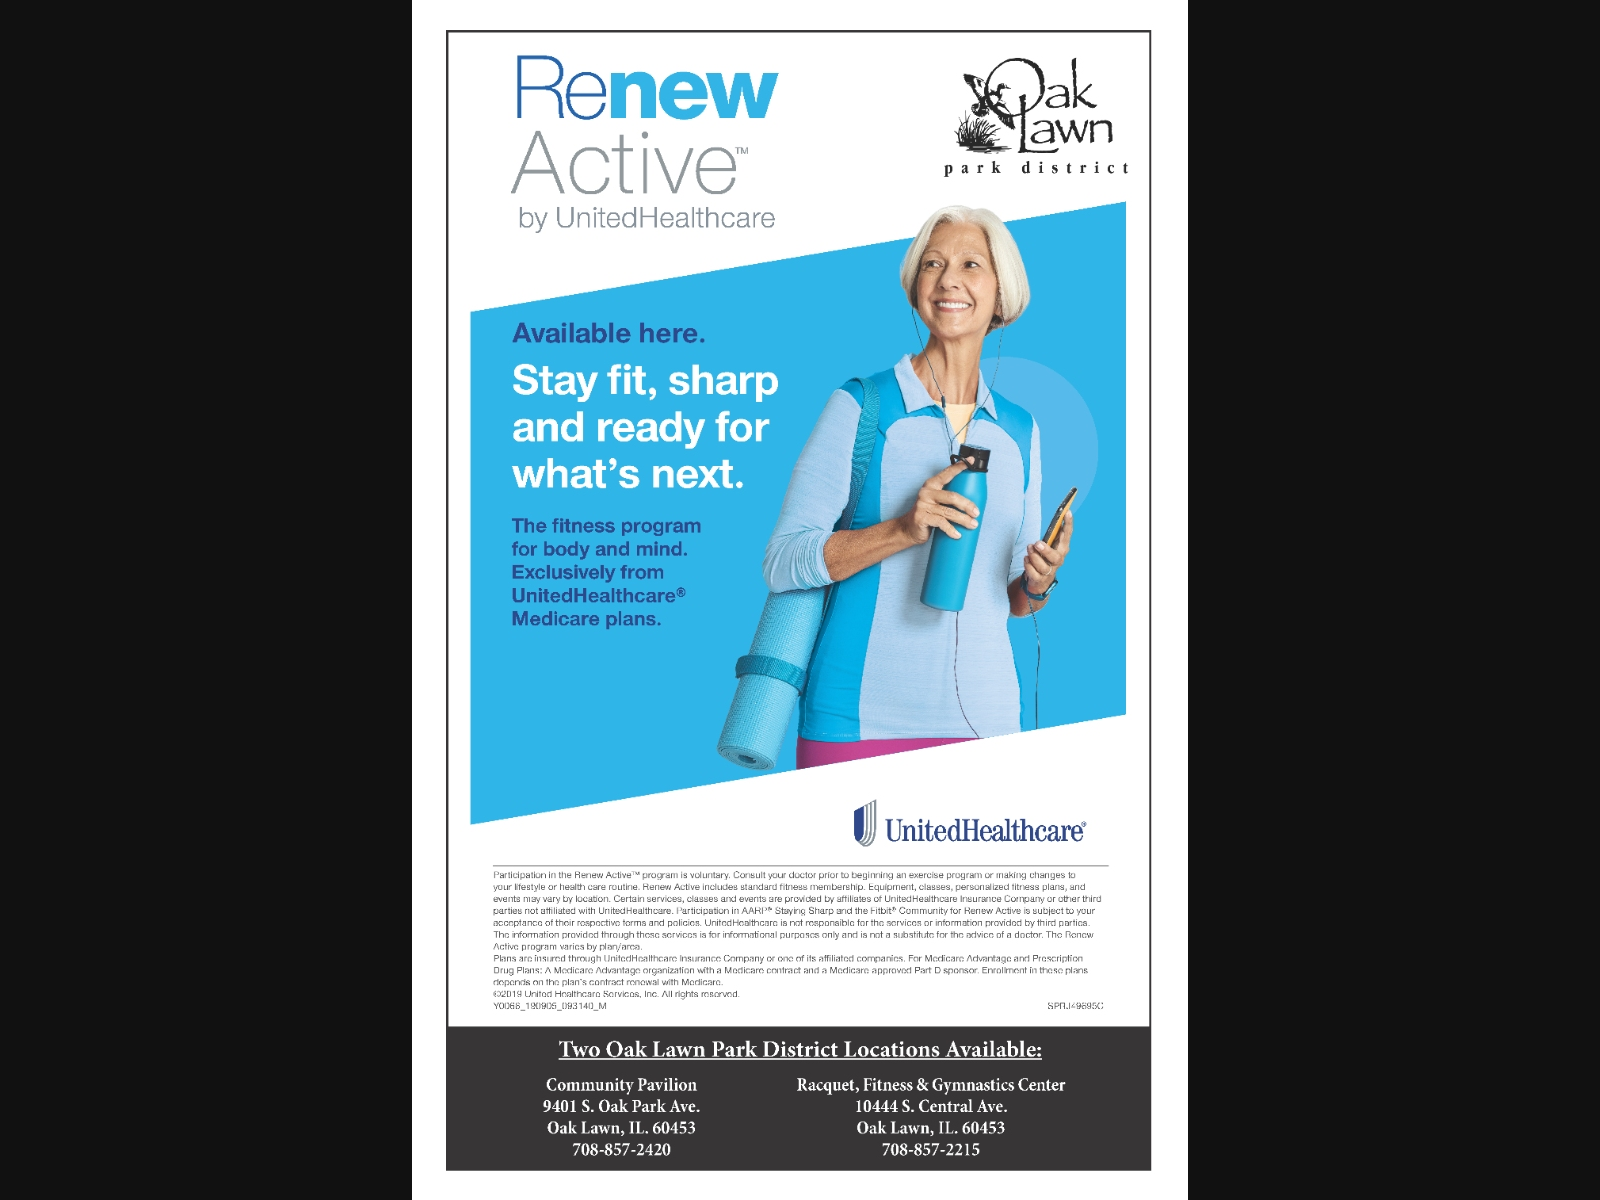 Renew Active™ Fitness Program Available at Oak Lawn Park District